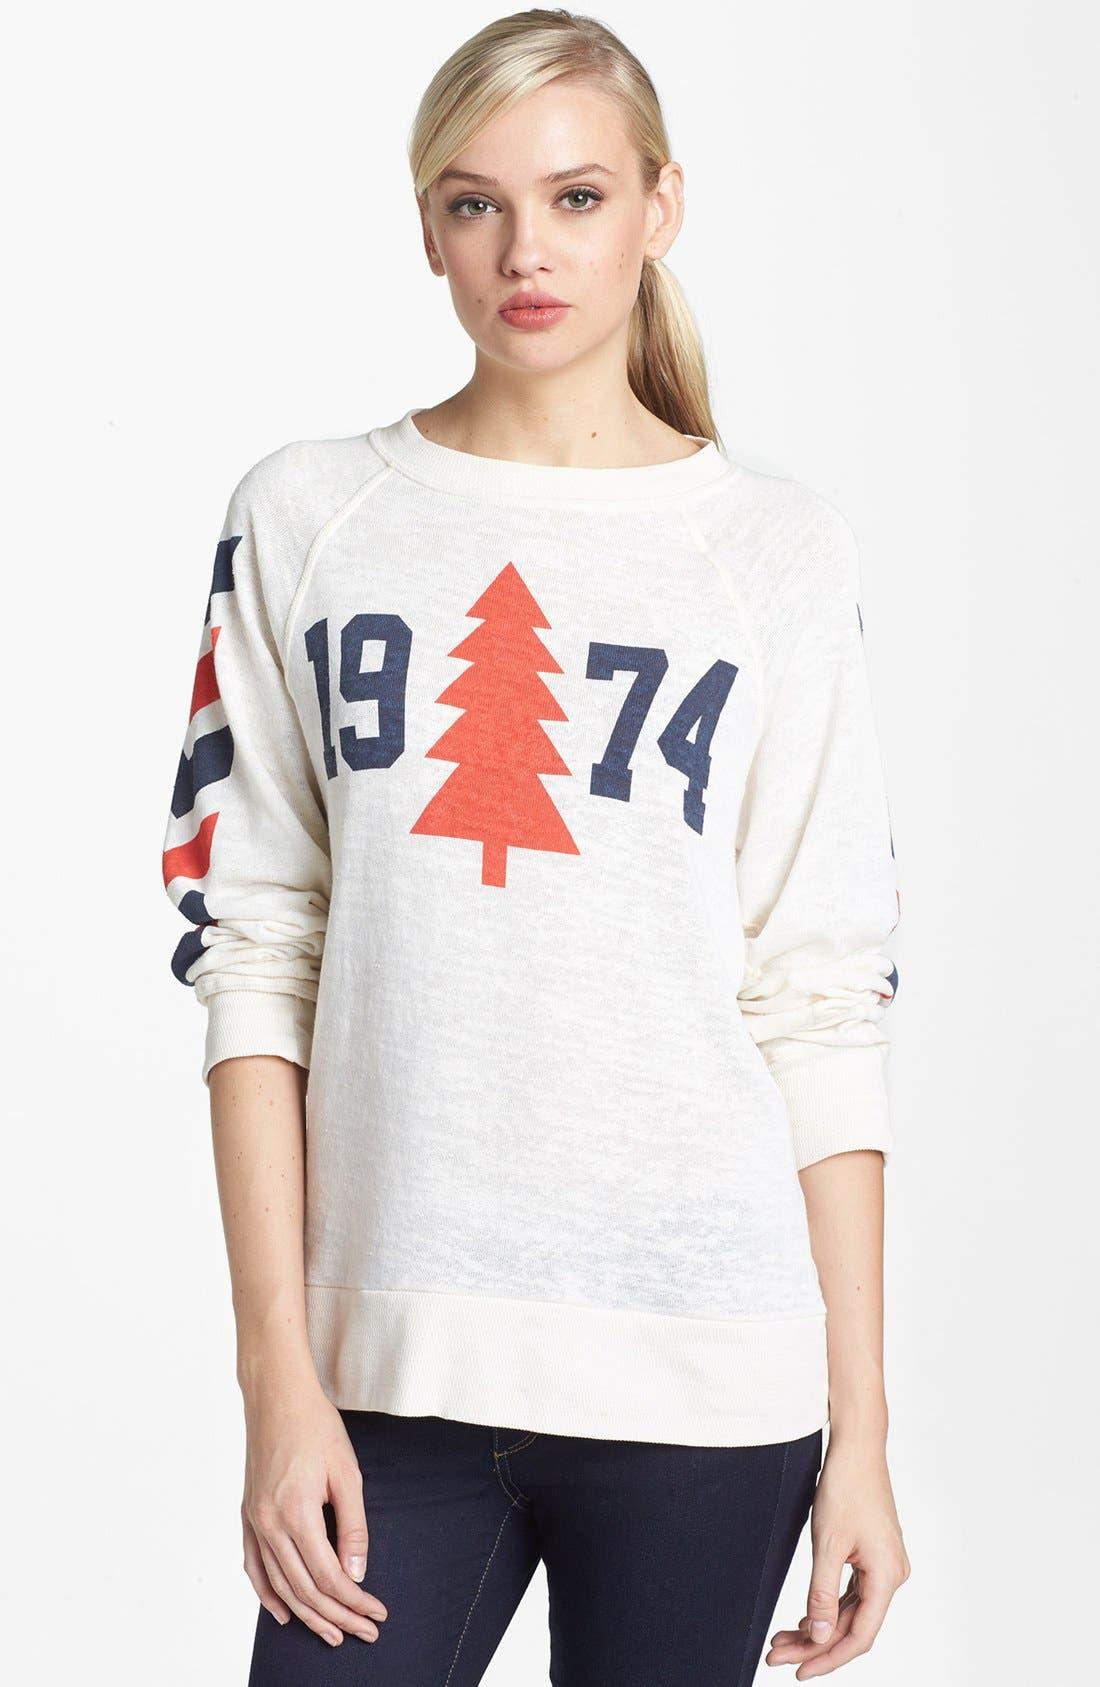 Alternate Image 1 Selected - Wildfox '1974 Nantucket' Sweatshirt